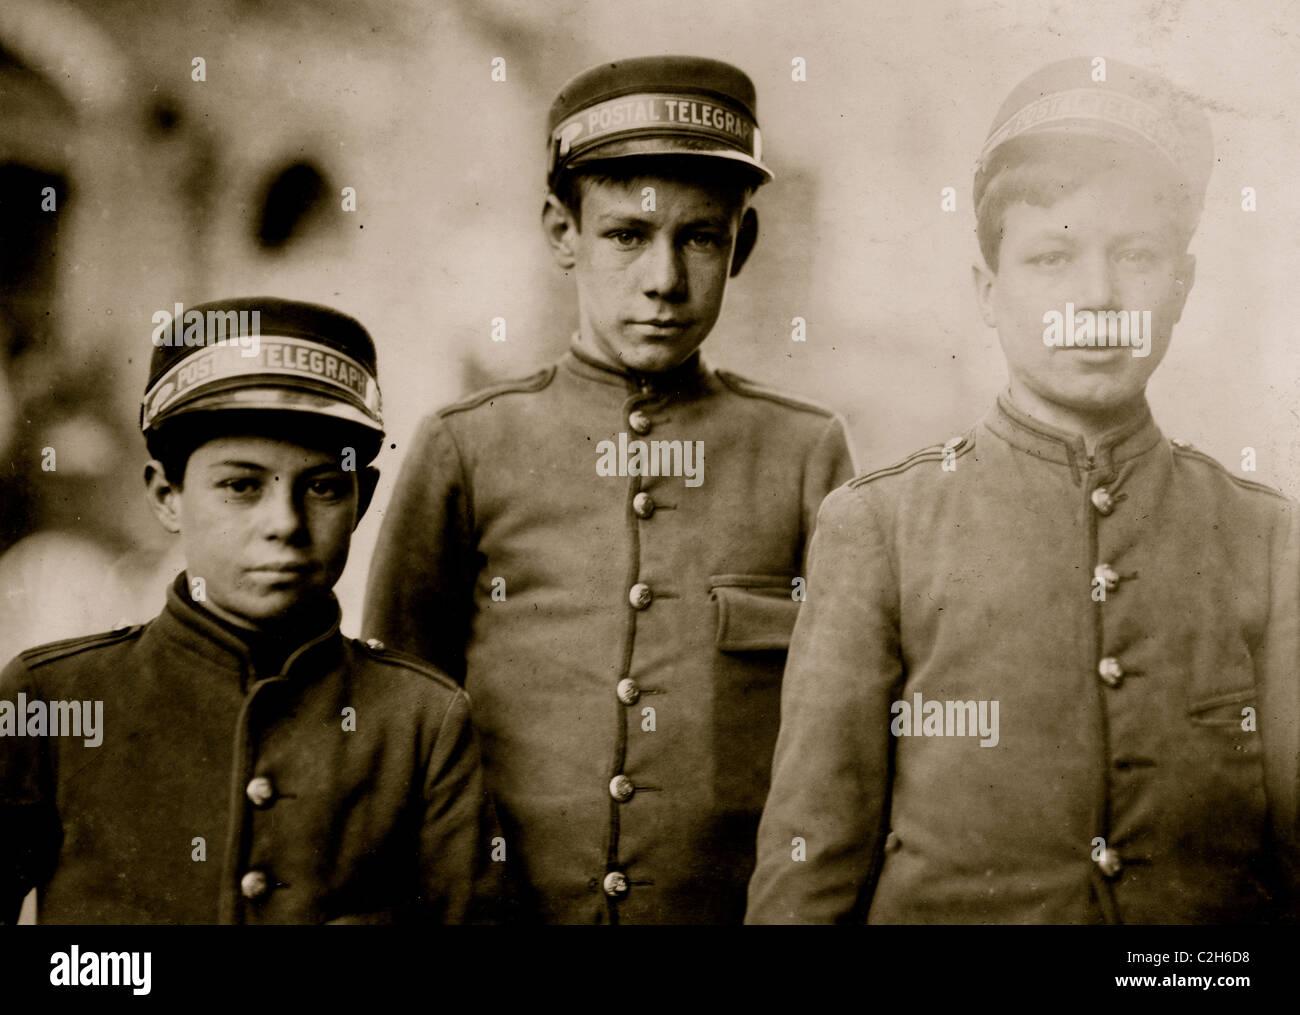 Postal Telegraph Messengers. - Stock Image